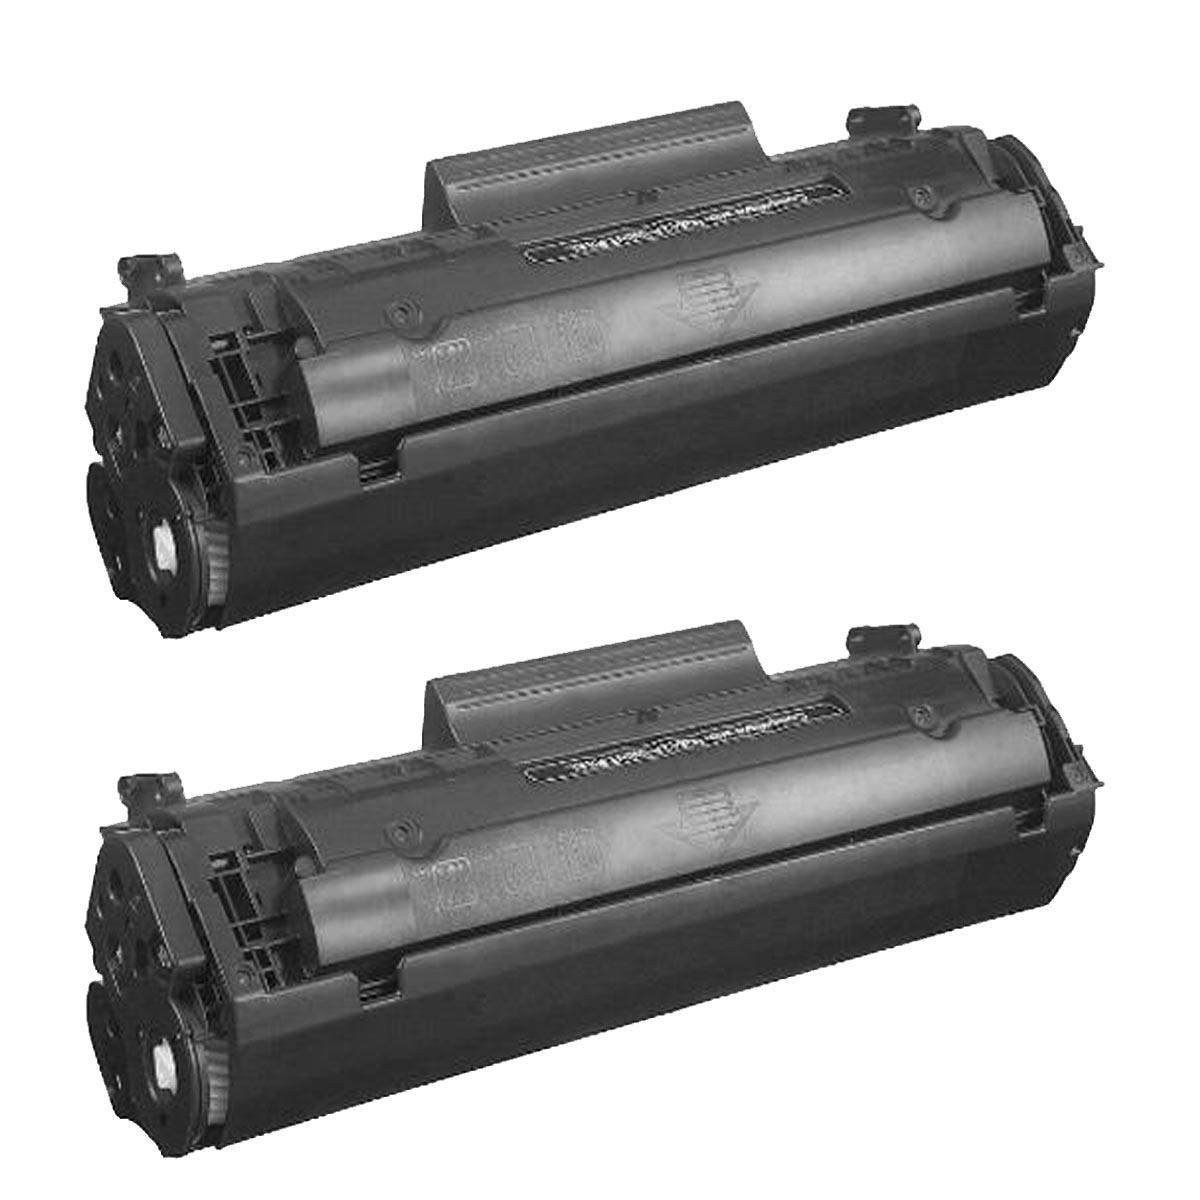 Kit 2 Toner Q2612A Q2612 2612 12A - 1018 1020 M1005